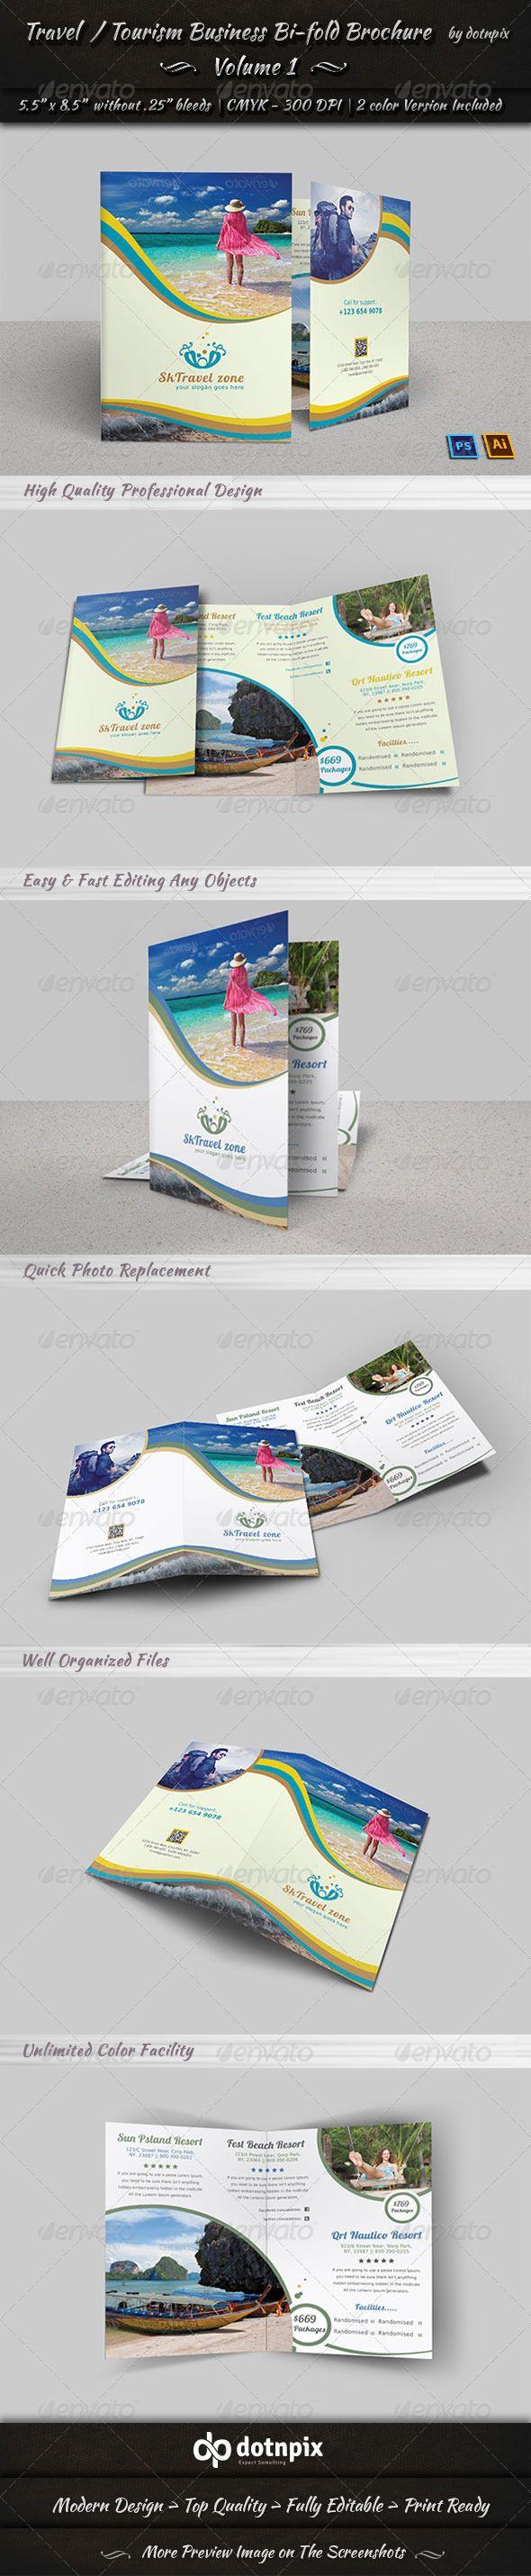 Travel / Tourism Bi-Fold Brochure - Volume 1